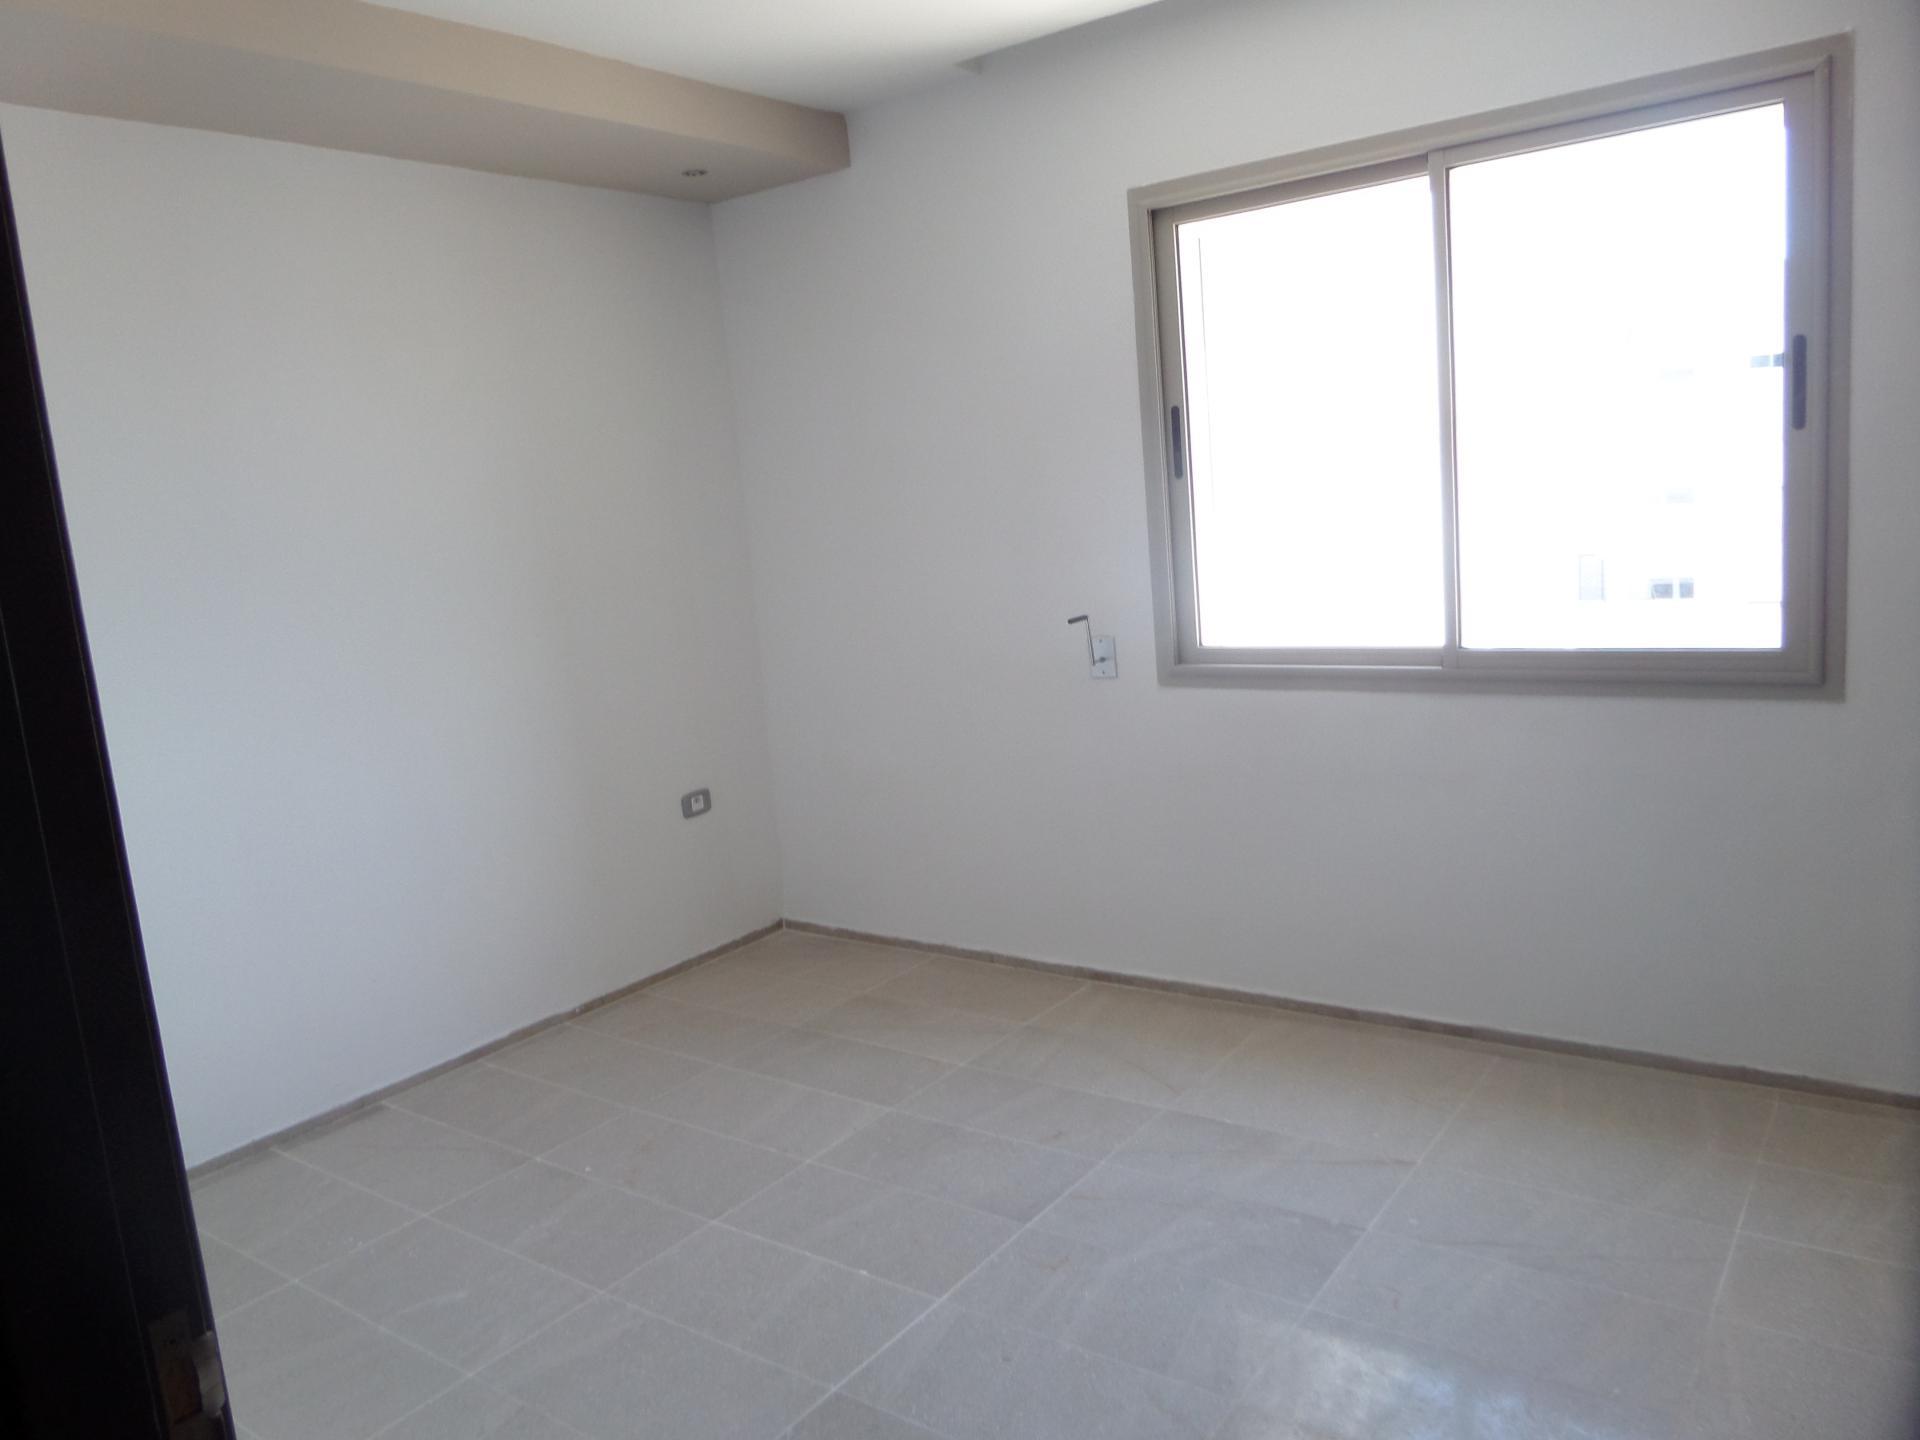 A vendre un appartement à Gammarth superieur